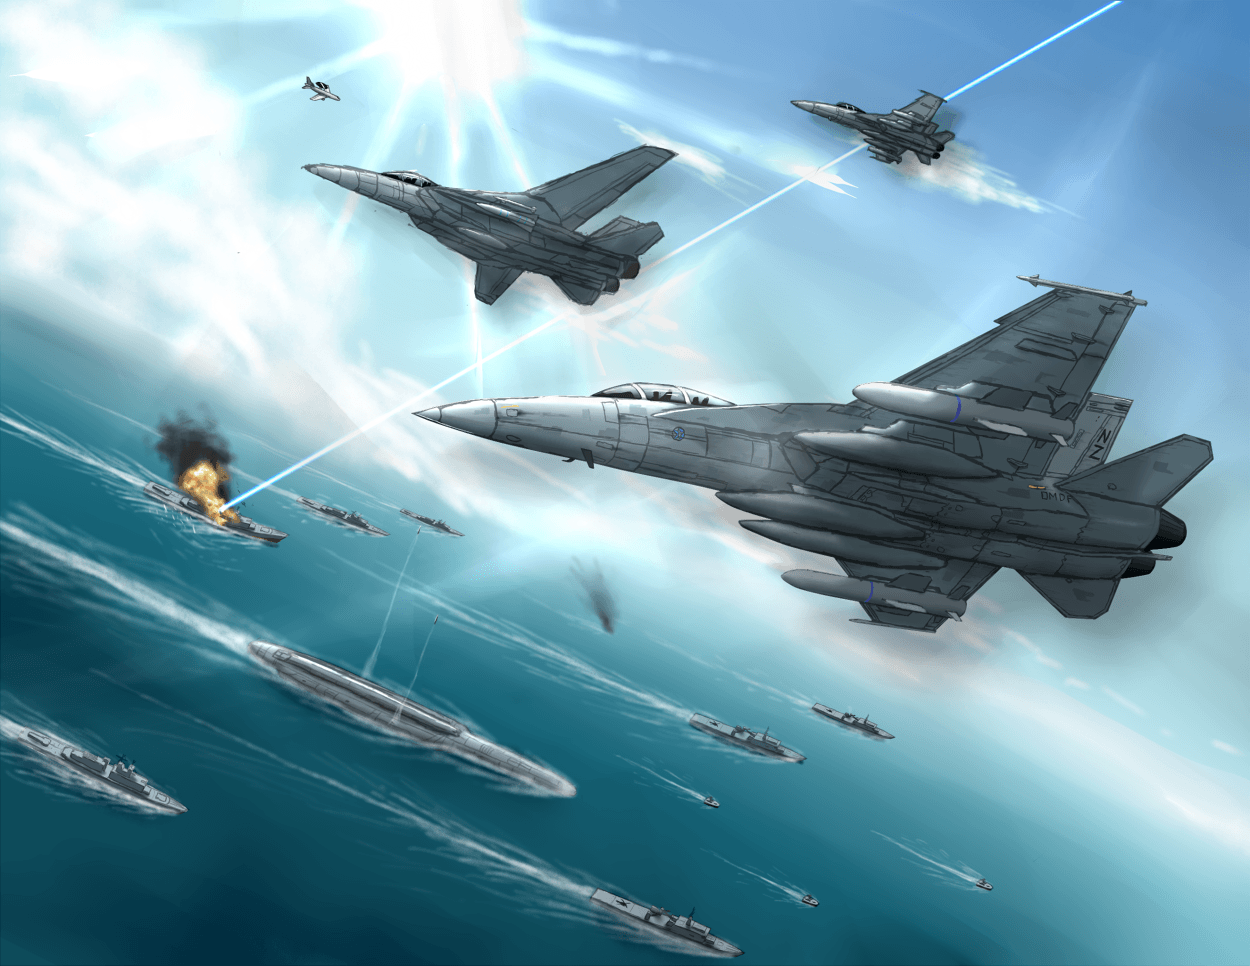 Ace Combat Wallpapers 1250x966